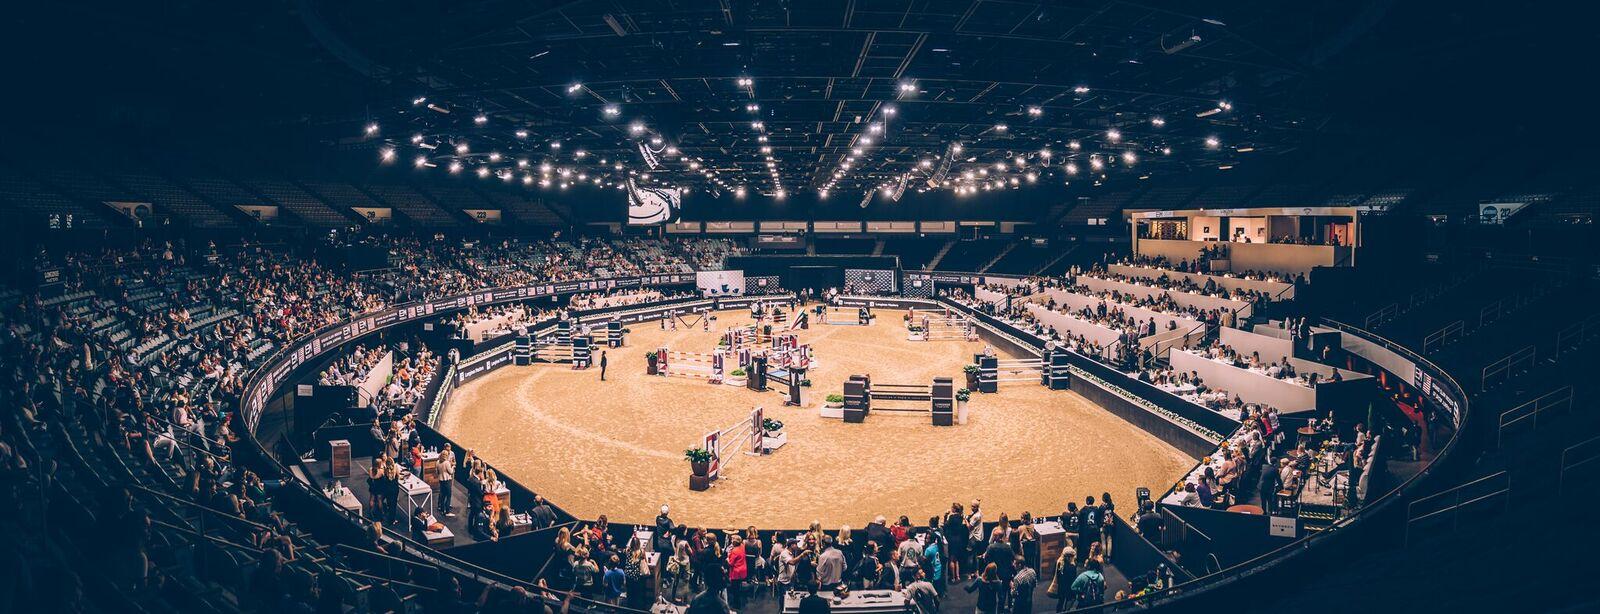 arena-longines